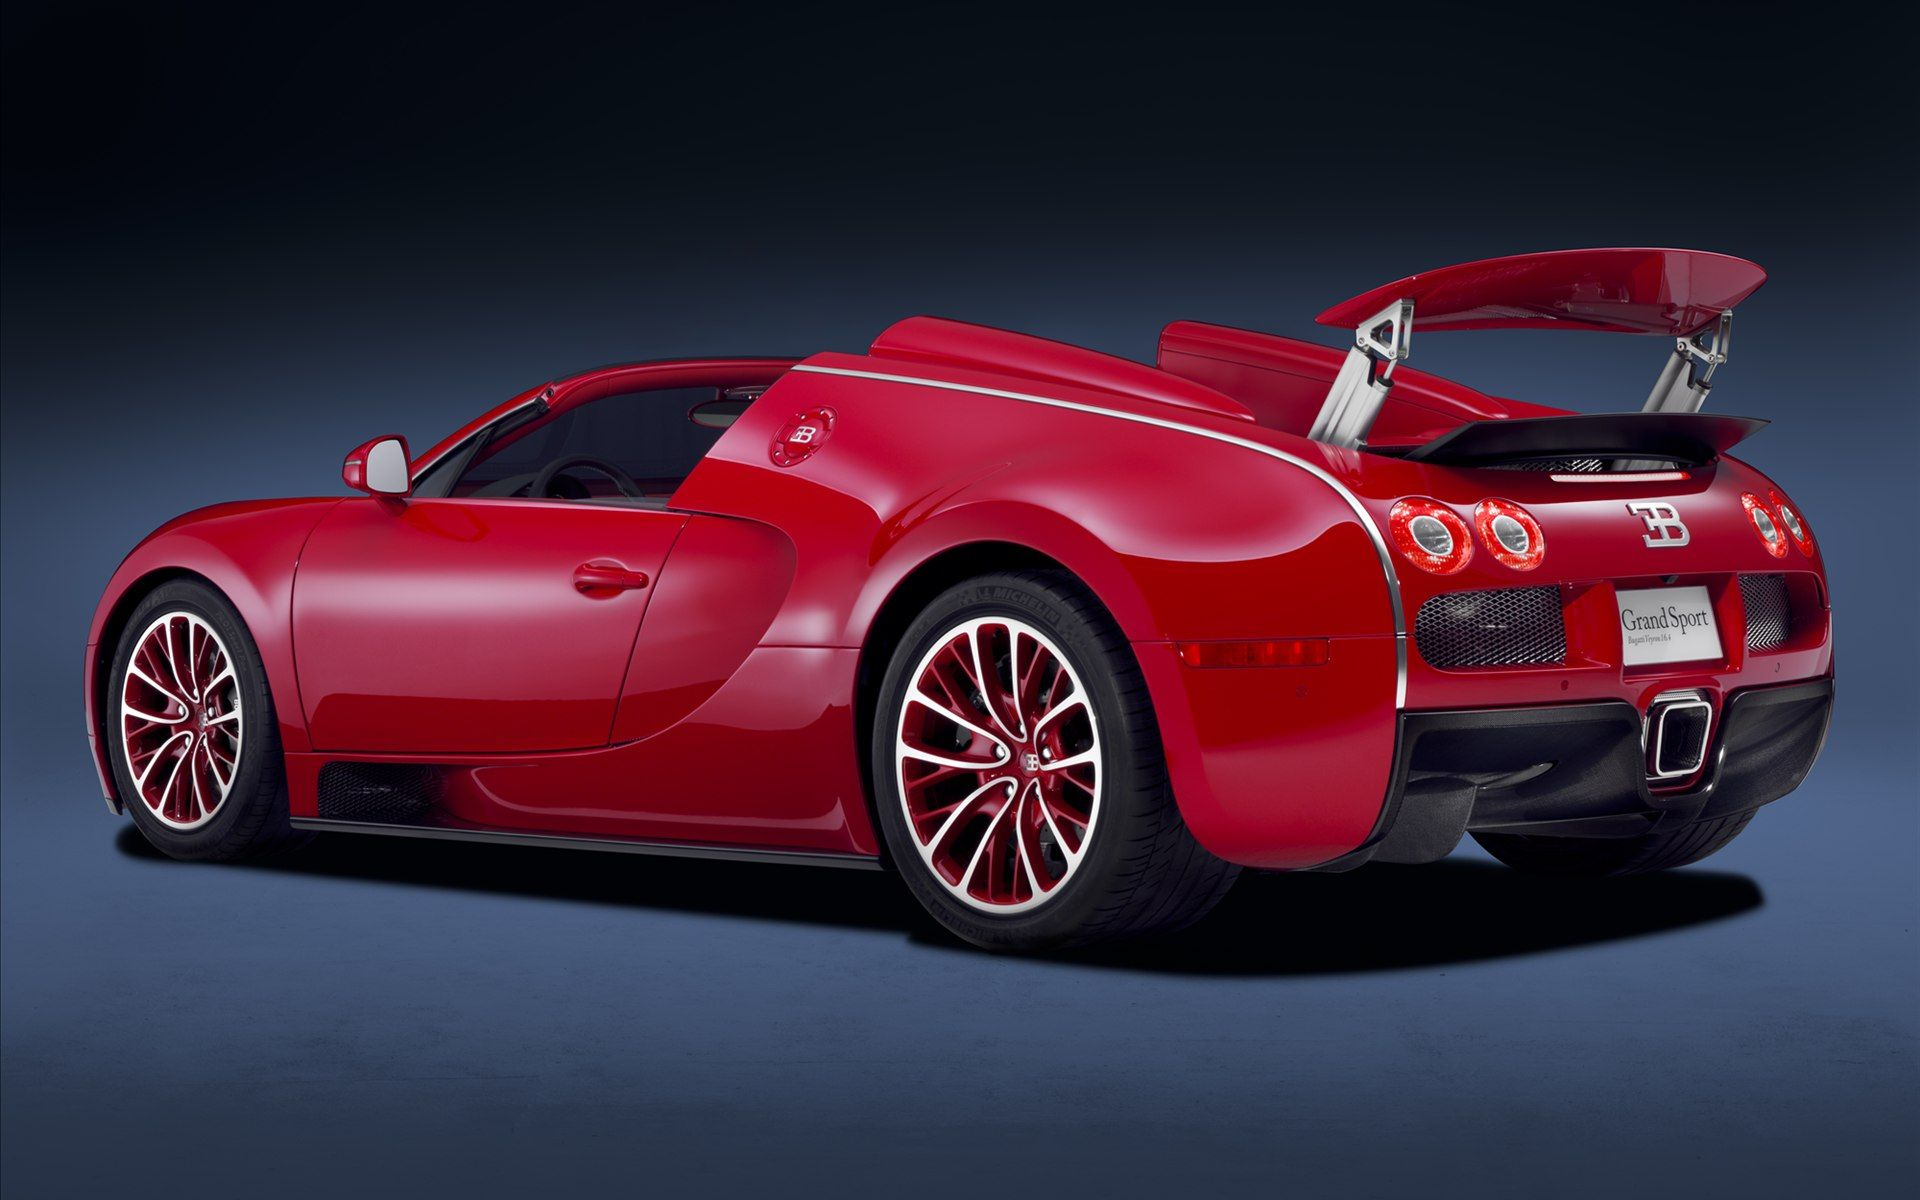 Bugatti Veyron I Pick This Because It A Fast And Cool Car Bugatti Veyron Bugatti Cars 2011 Bugatti Veyron